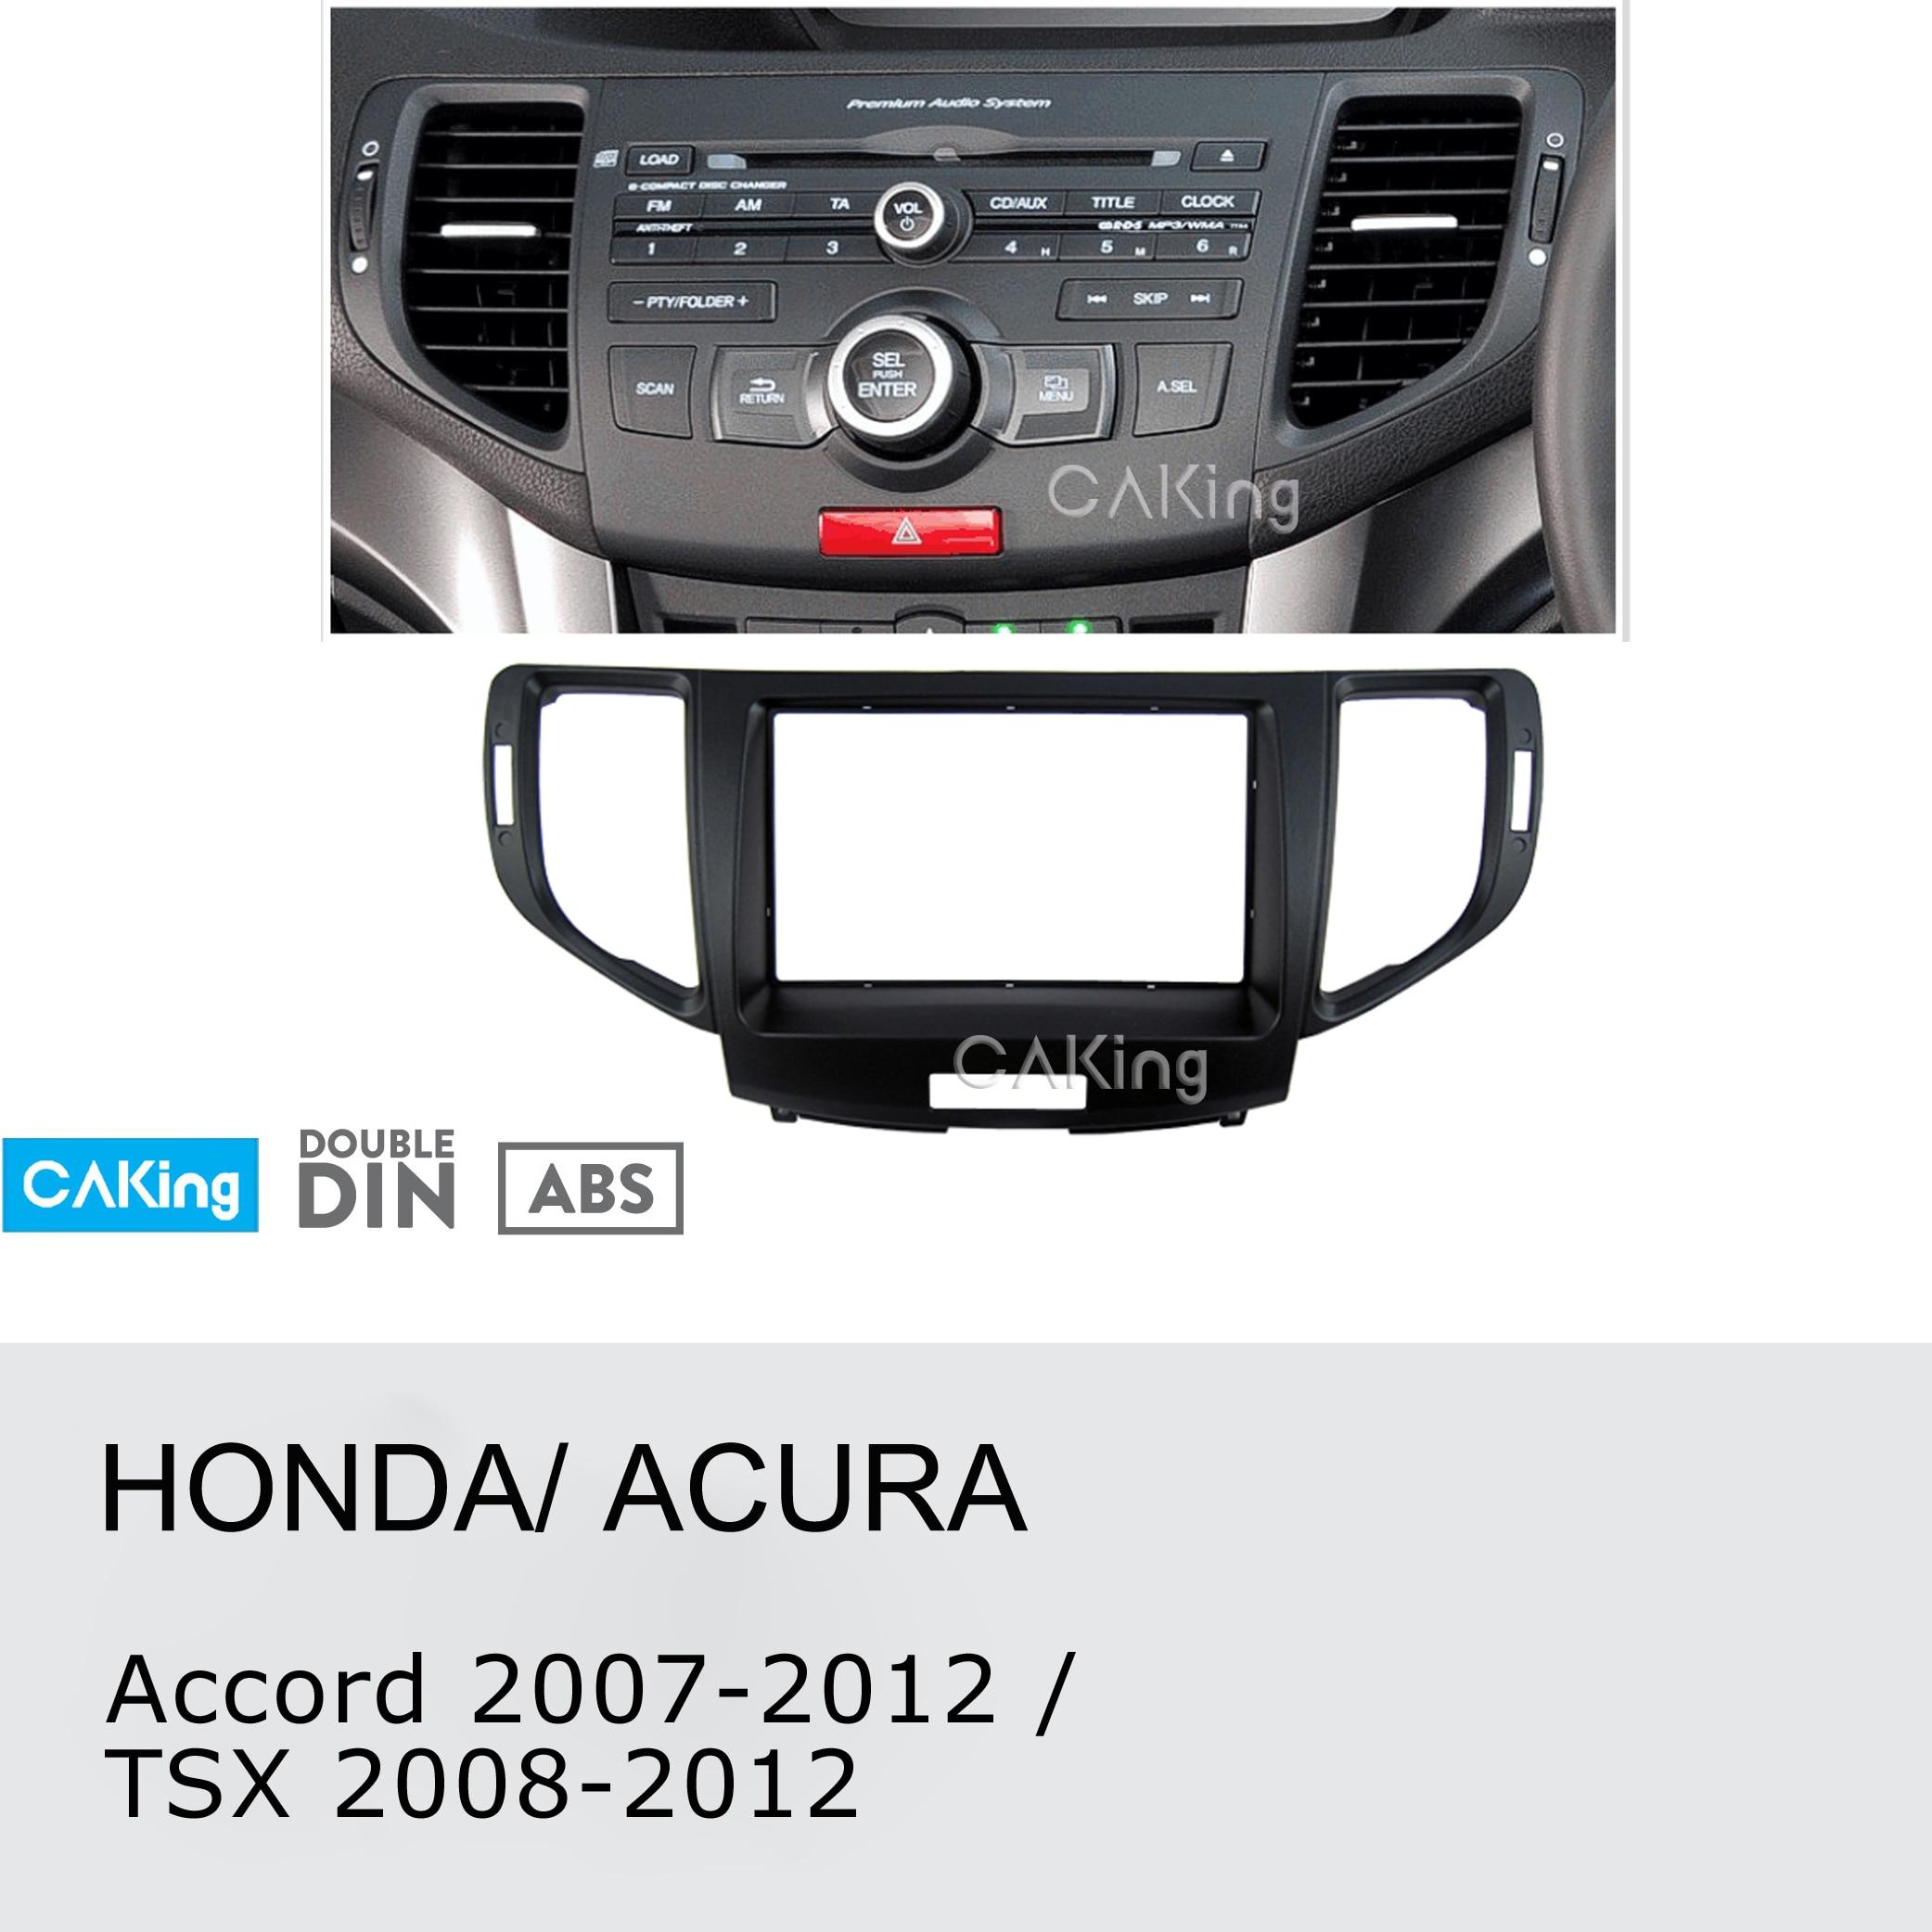 Double Din Car Fascia Radio Panel for Honda Accord 2008 2015 ACURA TSX 2008 2012 Dash